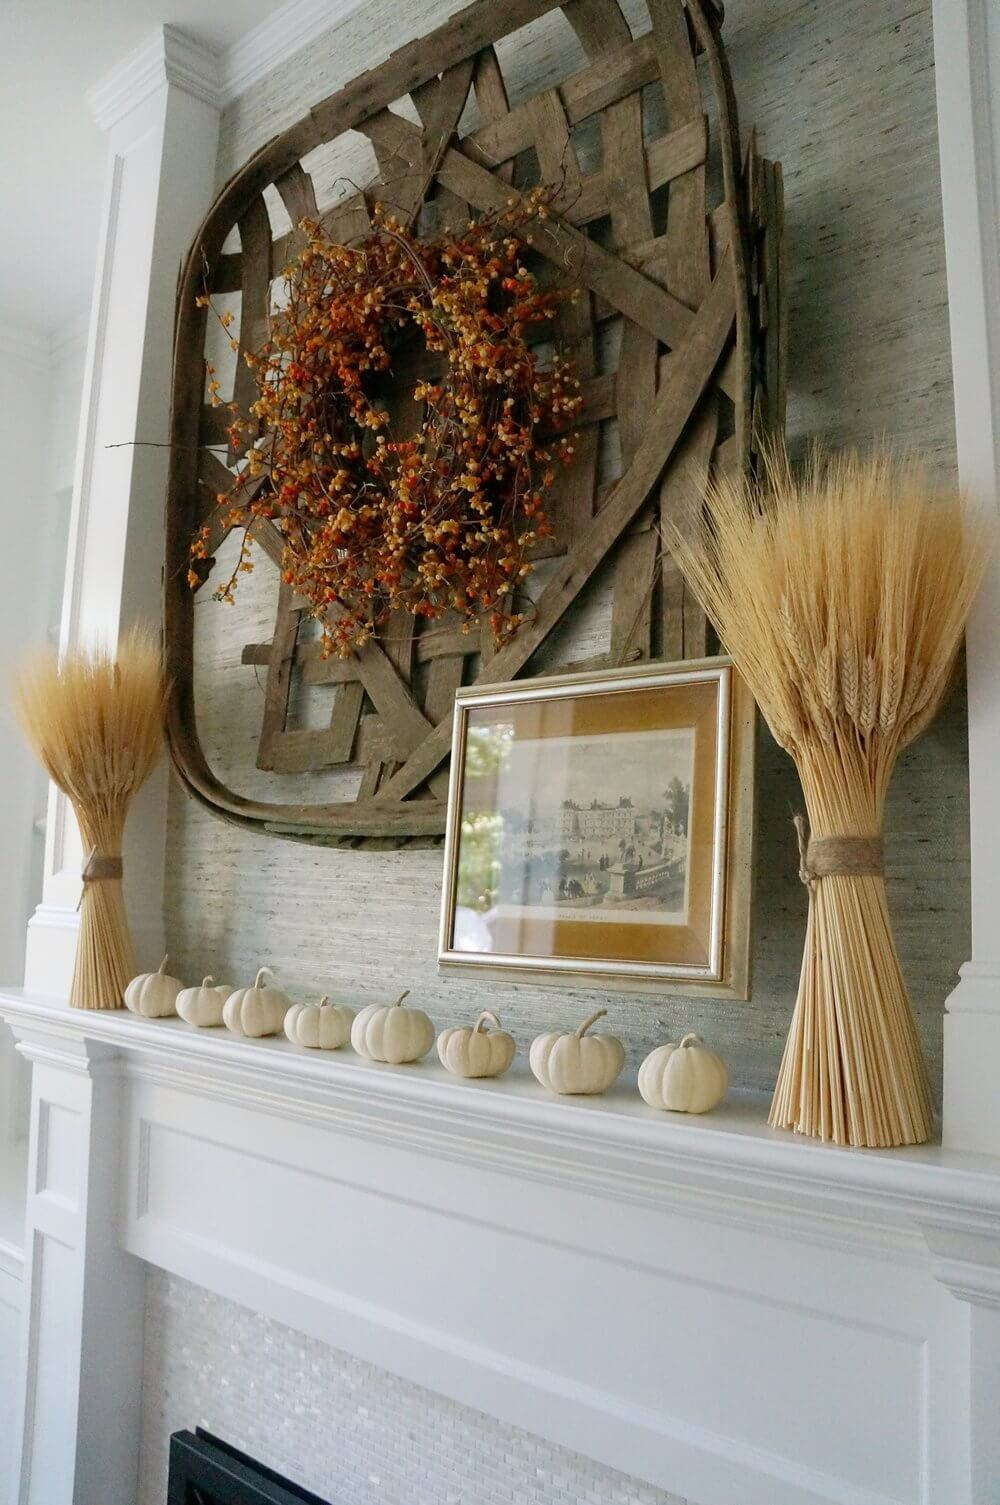 Amber Waves of Grain Fall Display